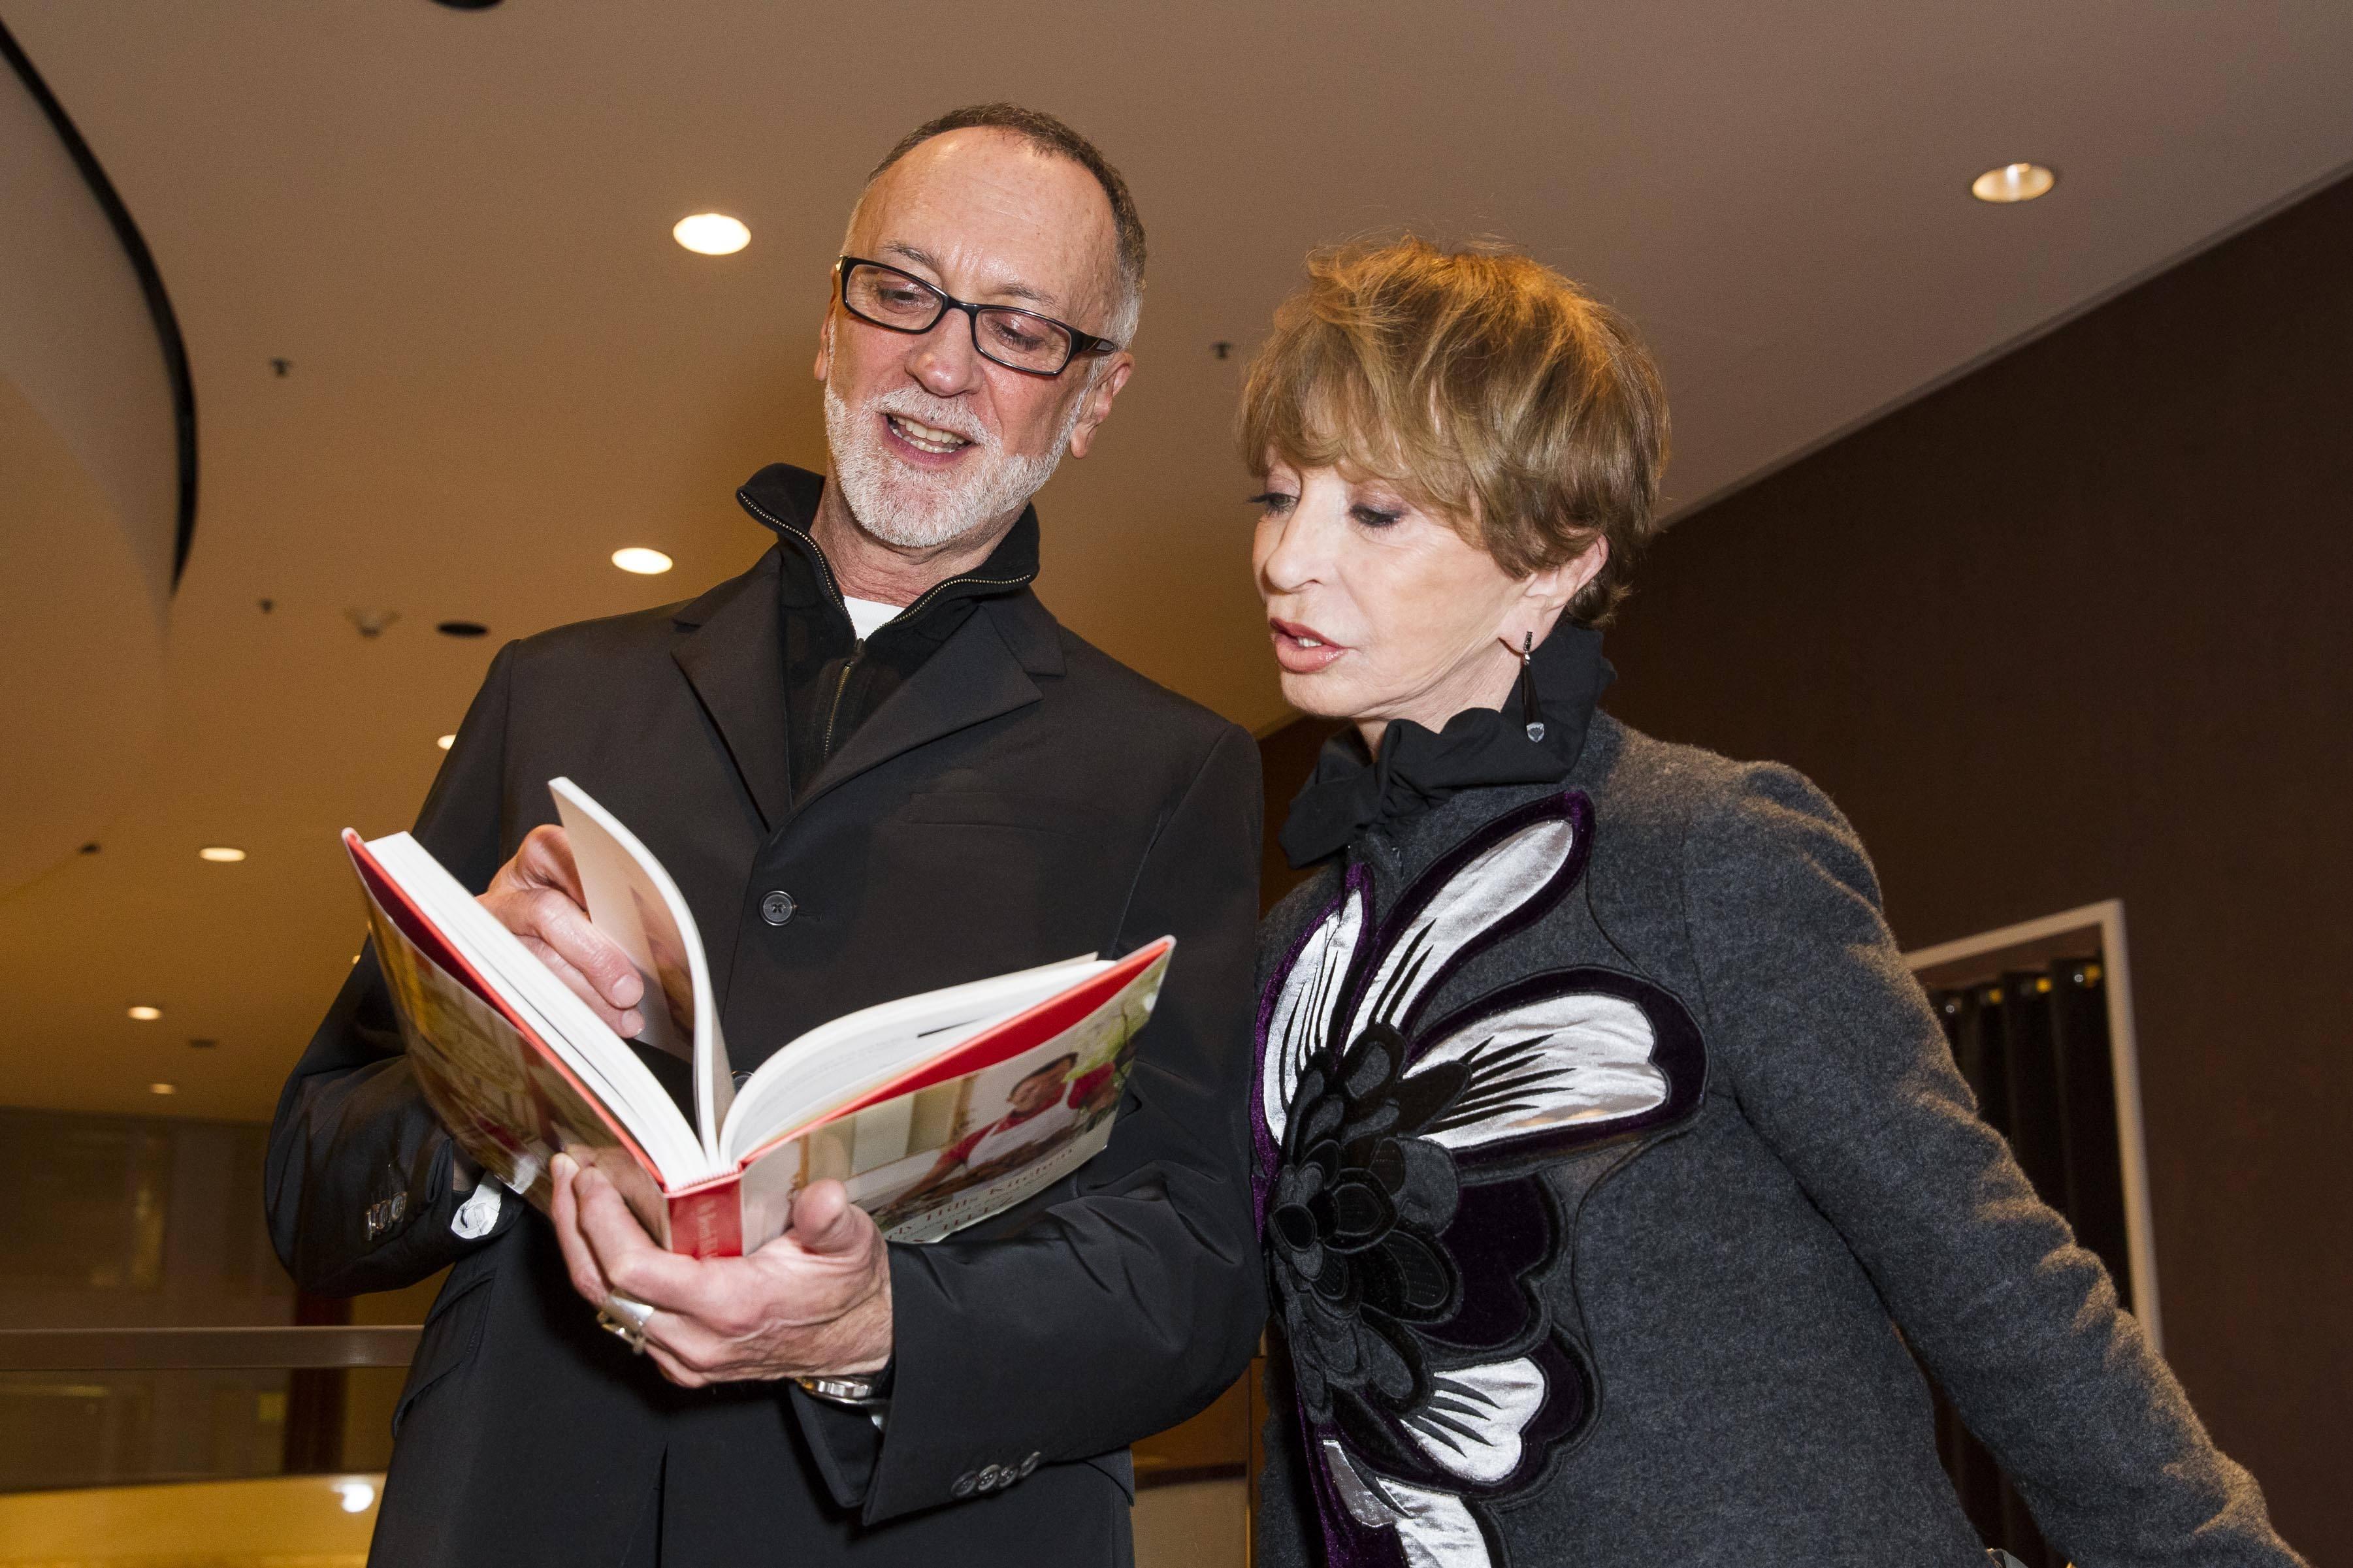 Alex Hitz Book Signing Neimans